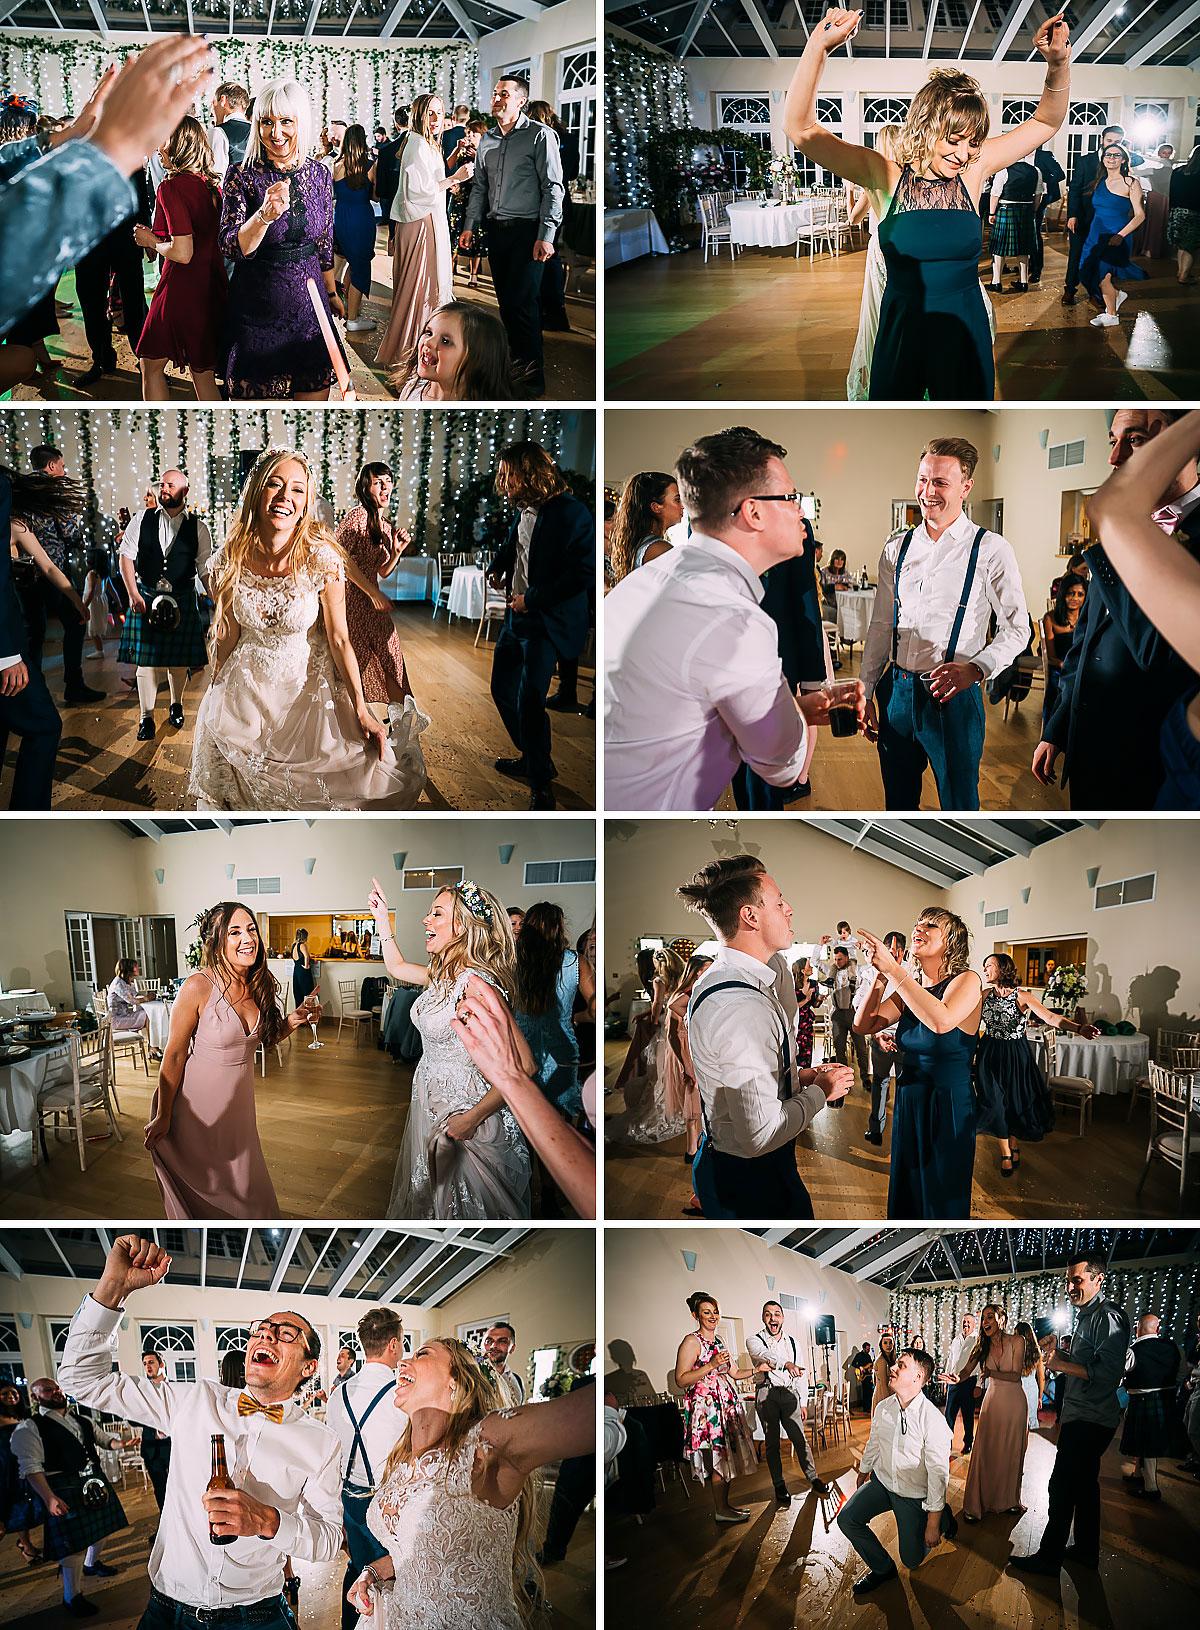 dancing inside Knowle Manor